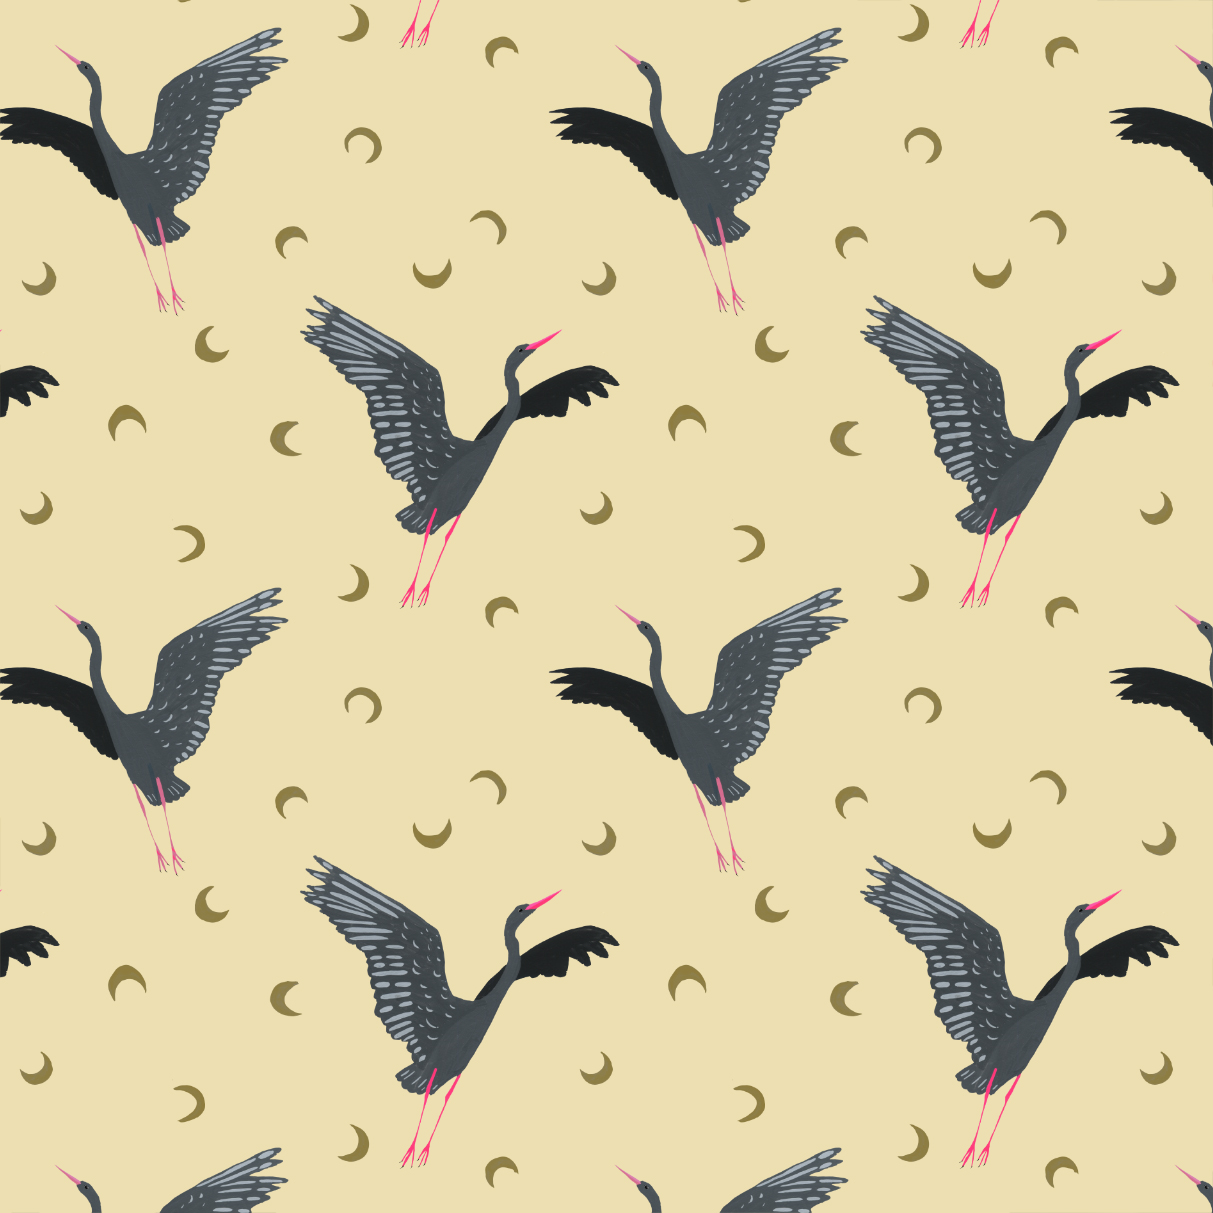 grey black heron pattern flat.jpg